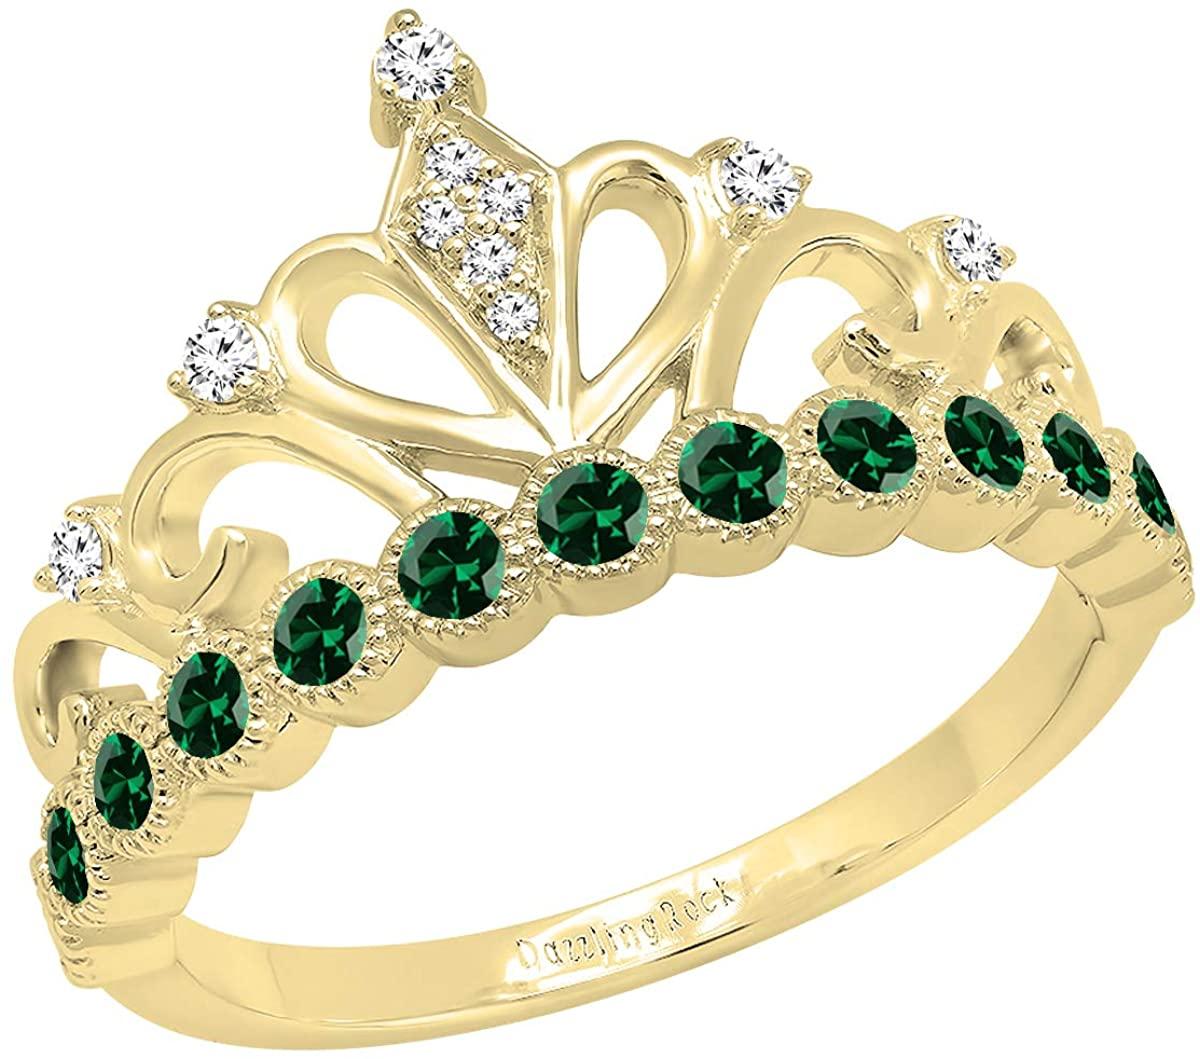 Dazzlingrock Collection 10K Round Lab Created Gemstone & White Diamond Ladies Crown Engagement Ring 1/2 CT, Yellow Gold